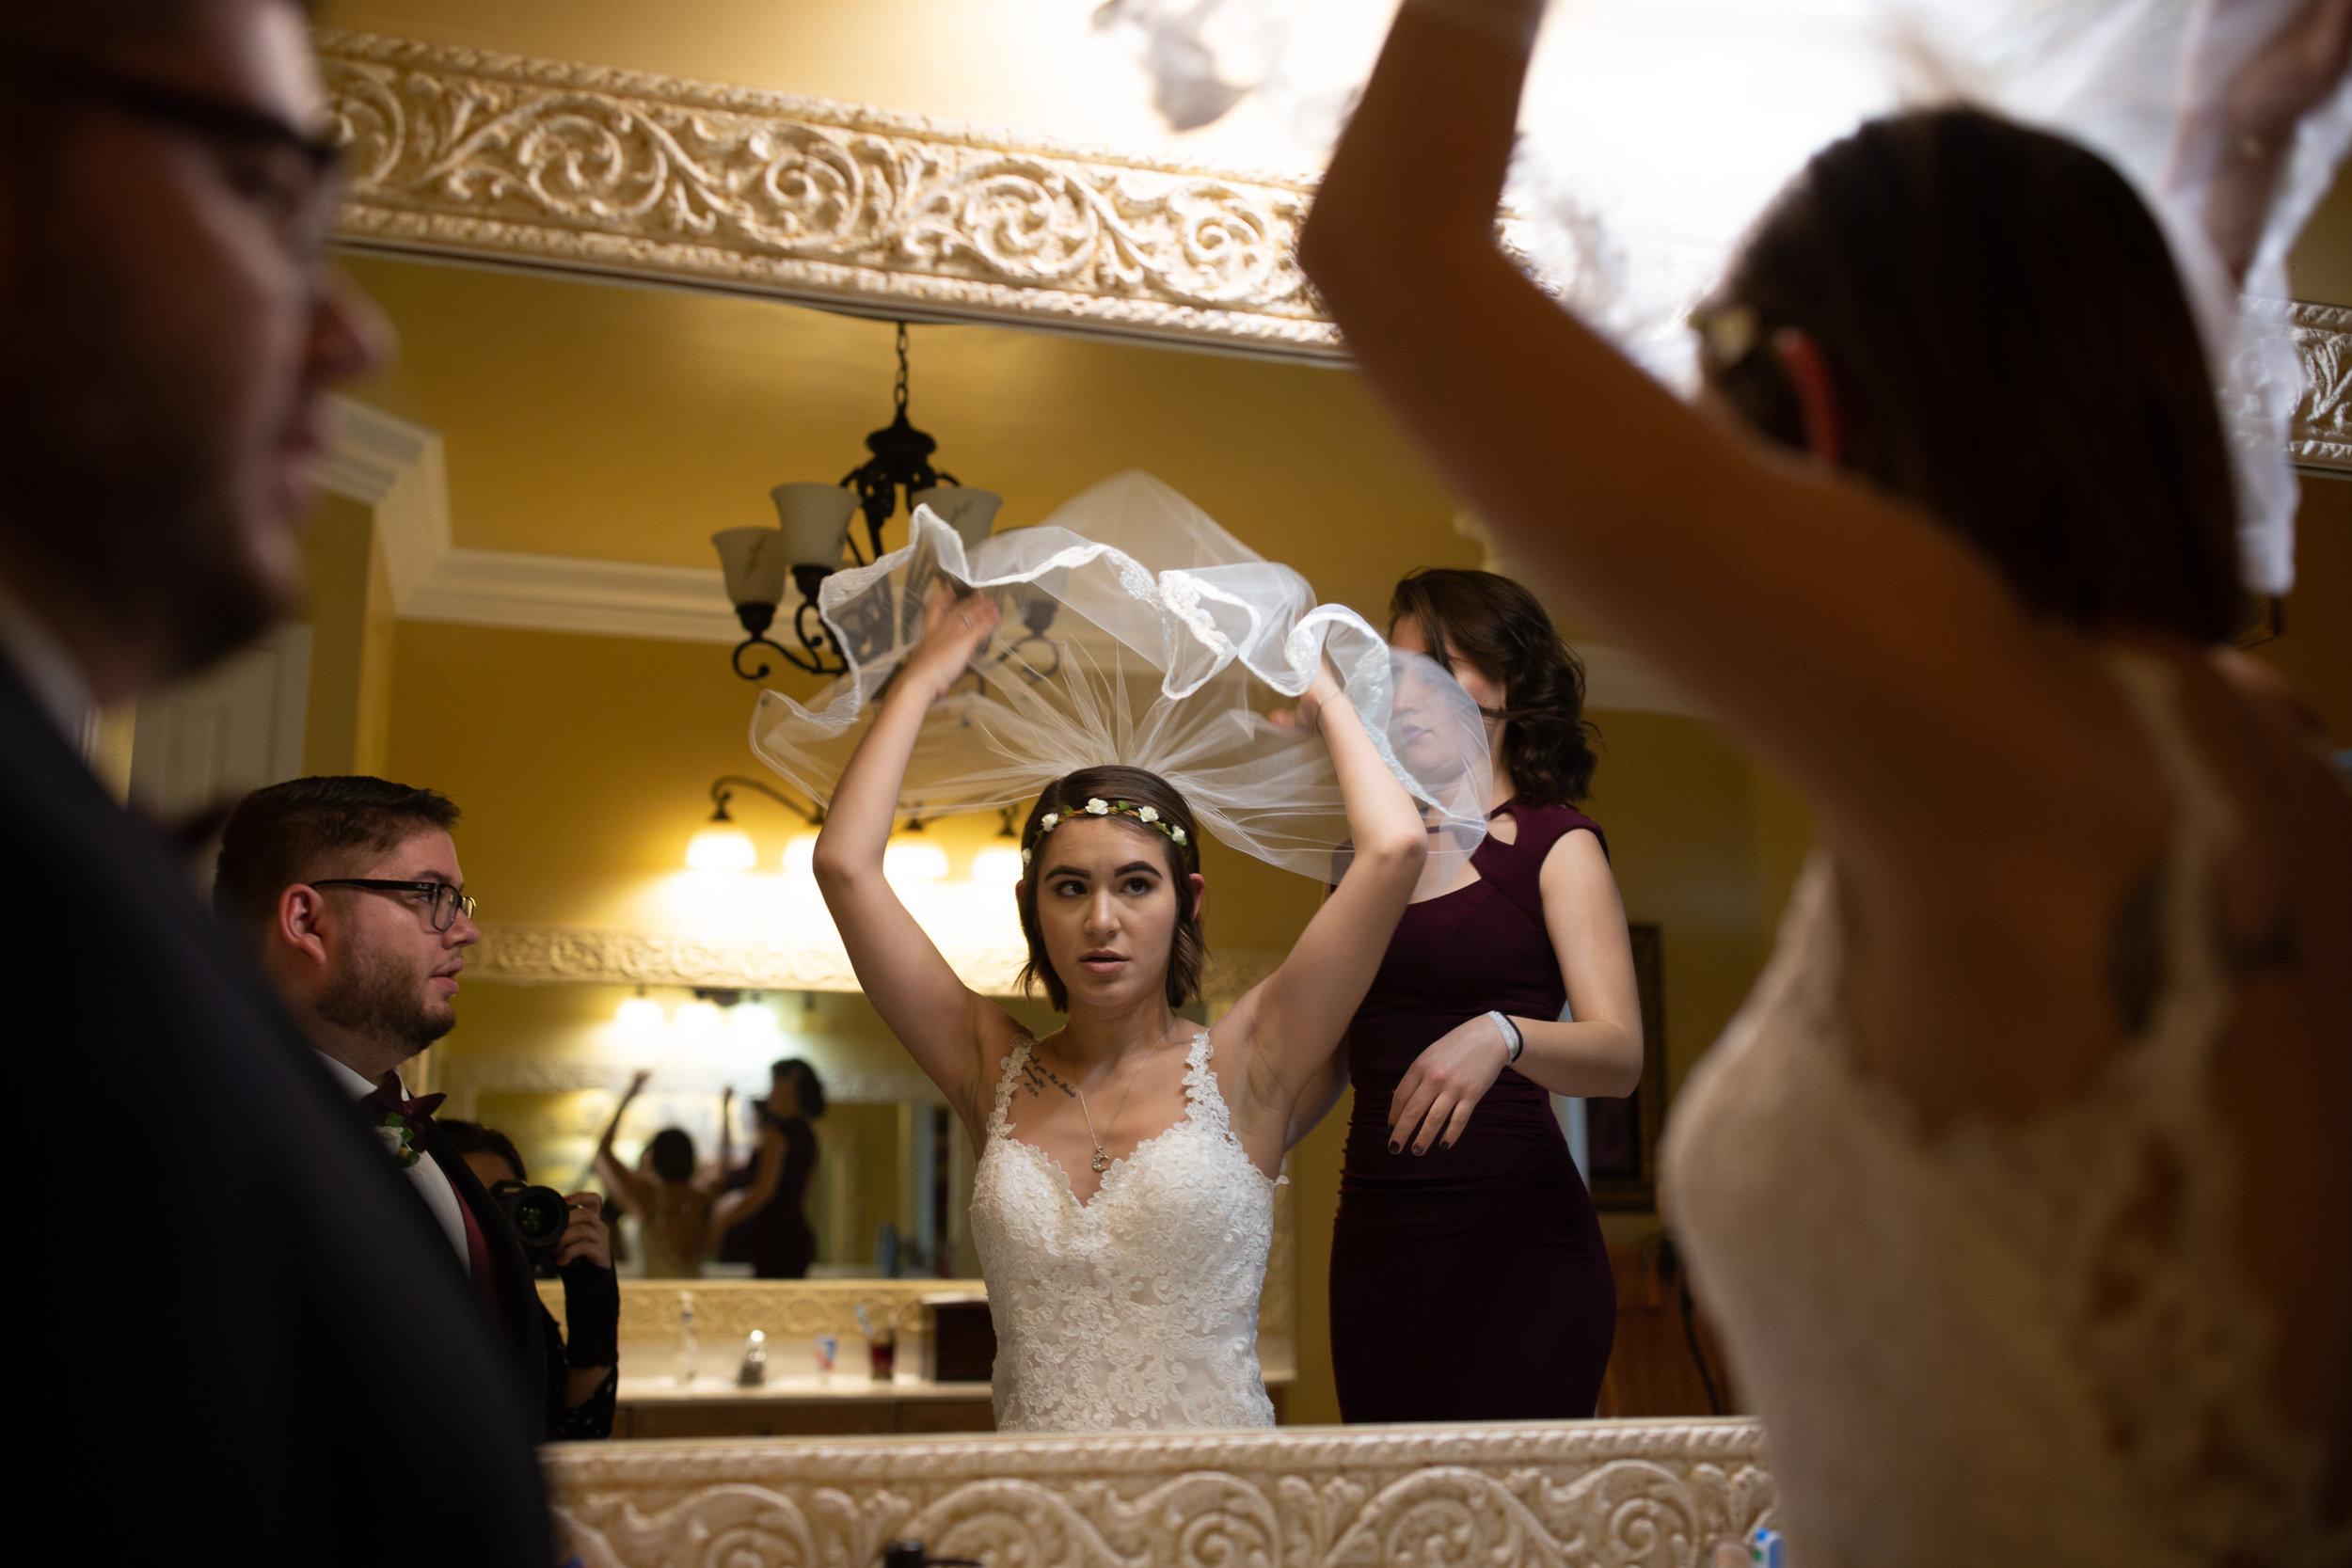 southwest_ranches_wedding_photographer_getting_ready_steph_lynn_photo-132.jpg